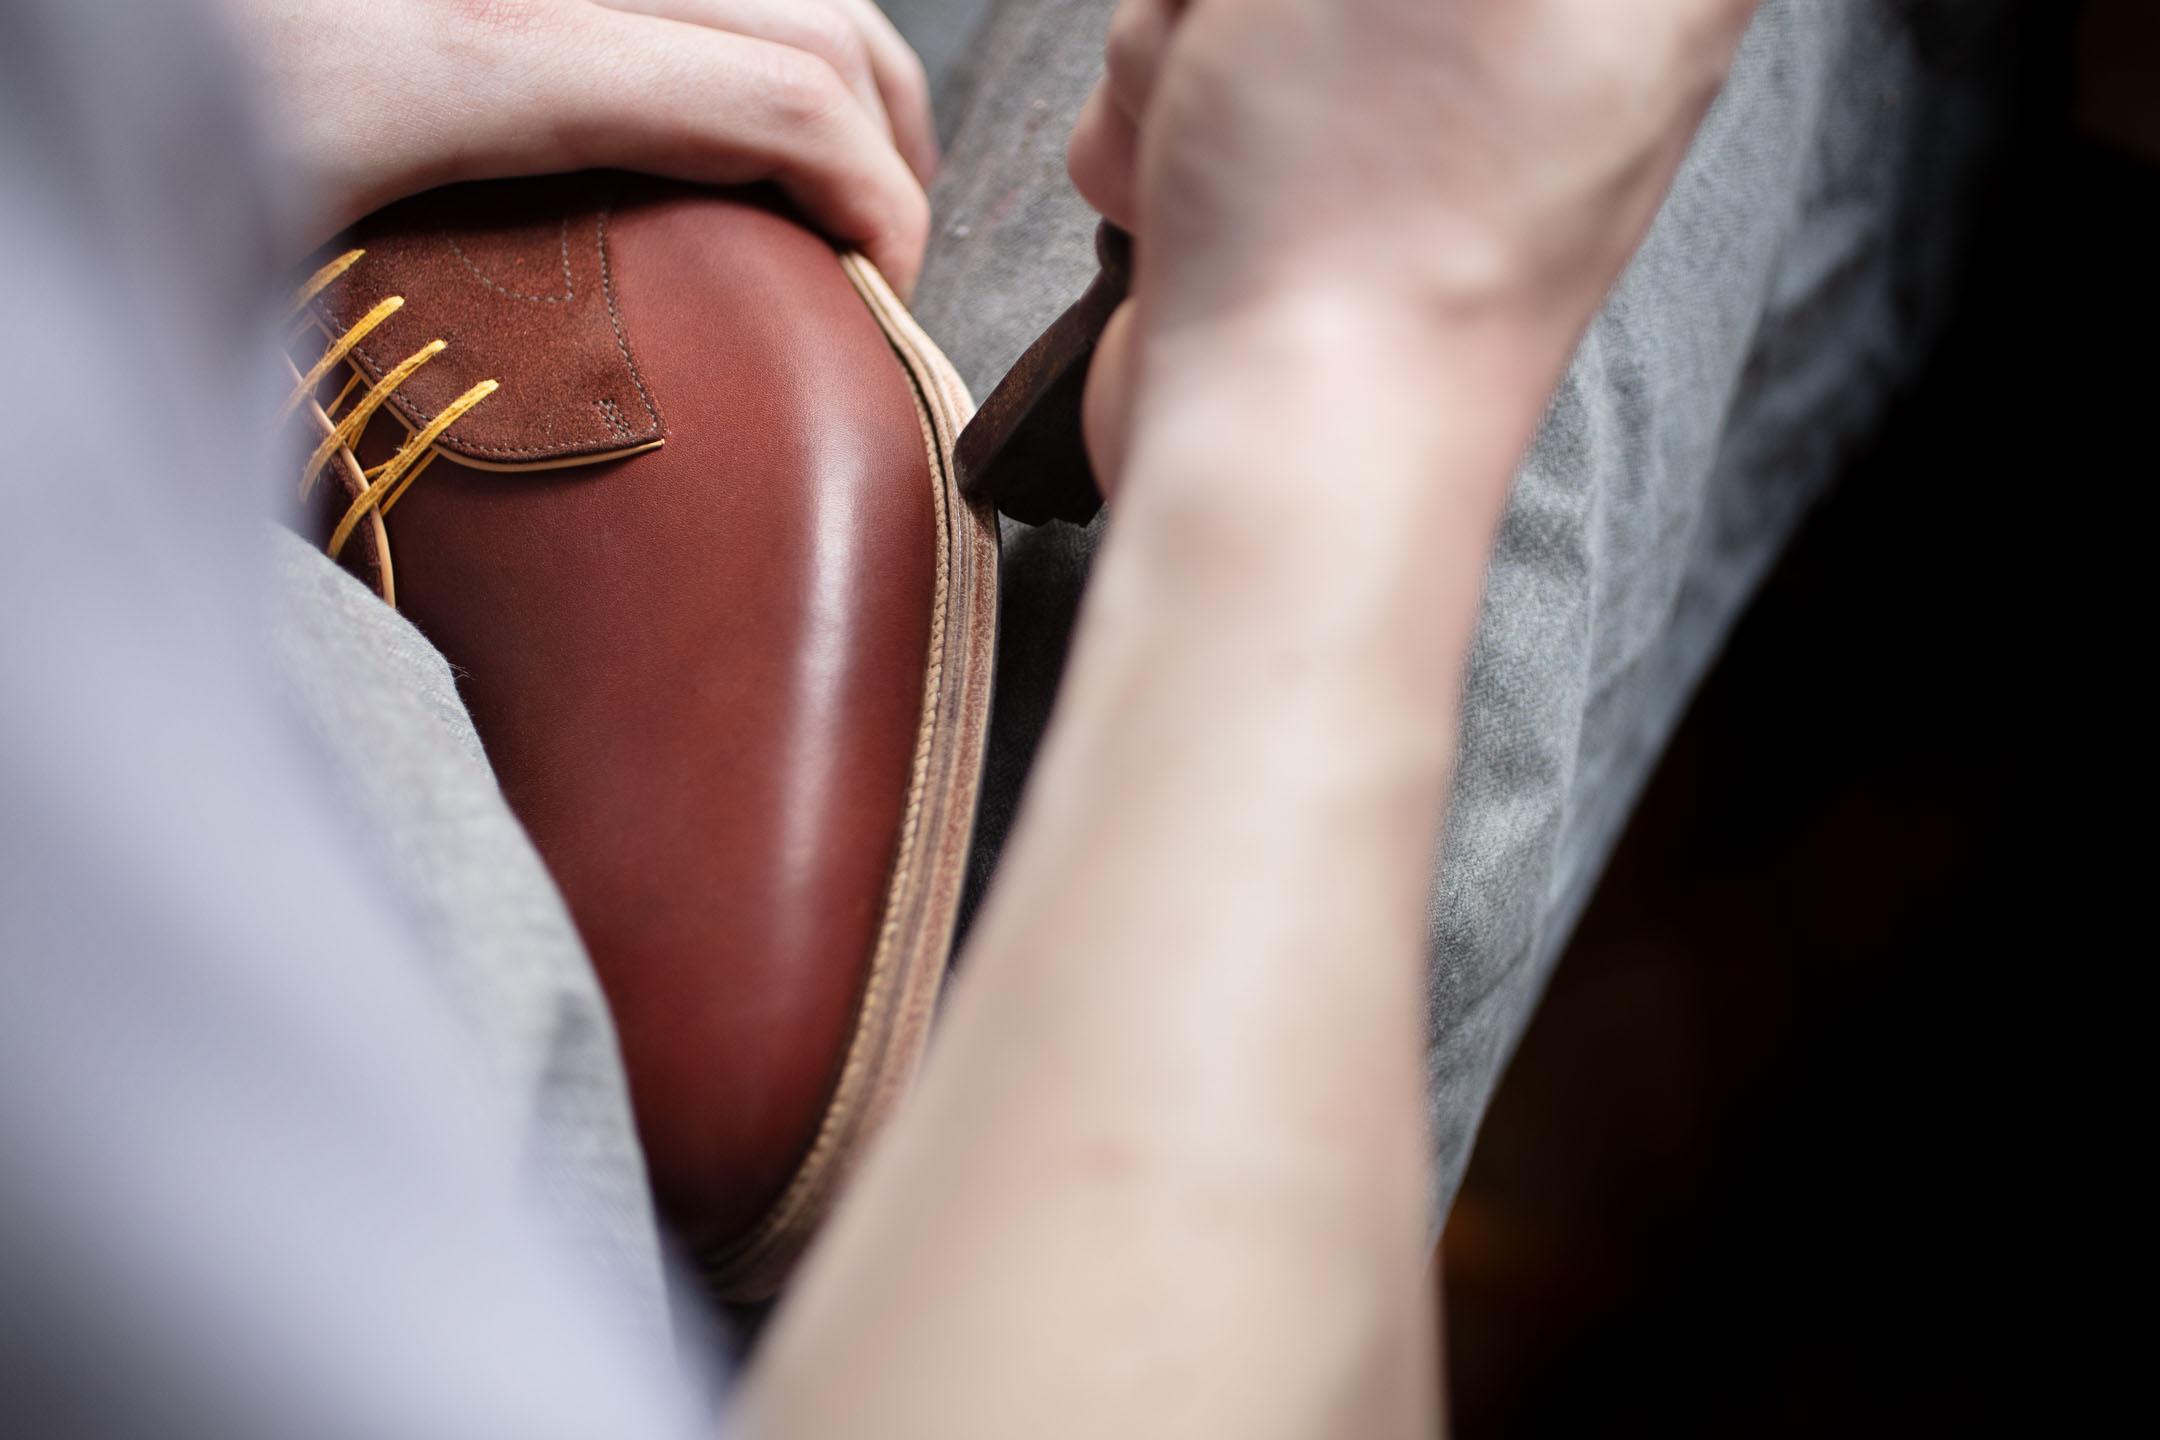 Schuhmacher bearbeitet Maßschuh - Detailaufnahme